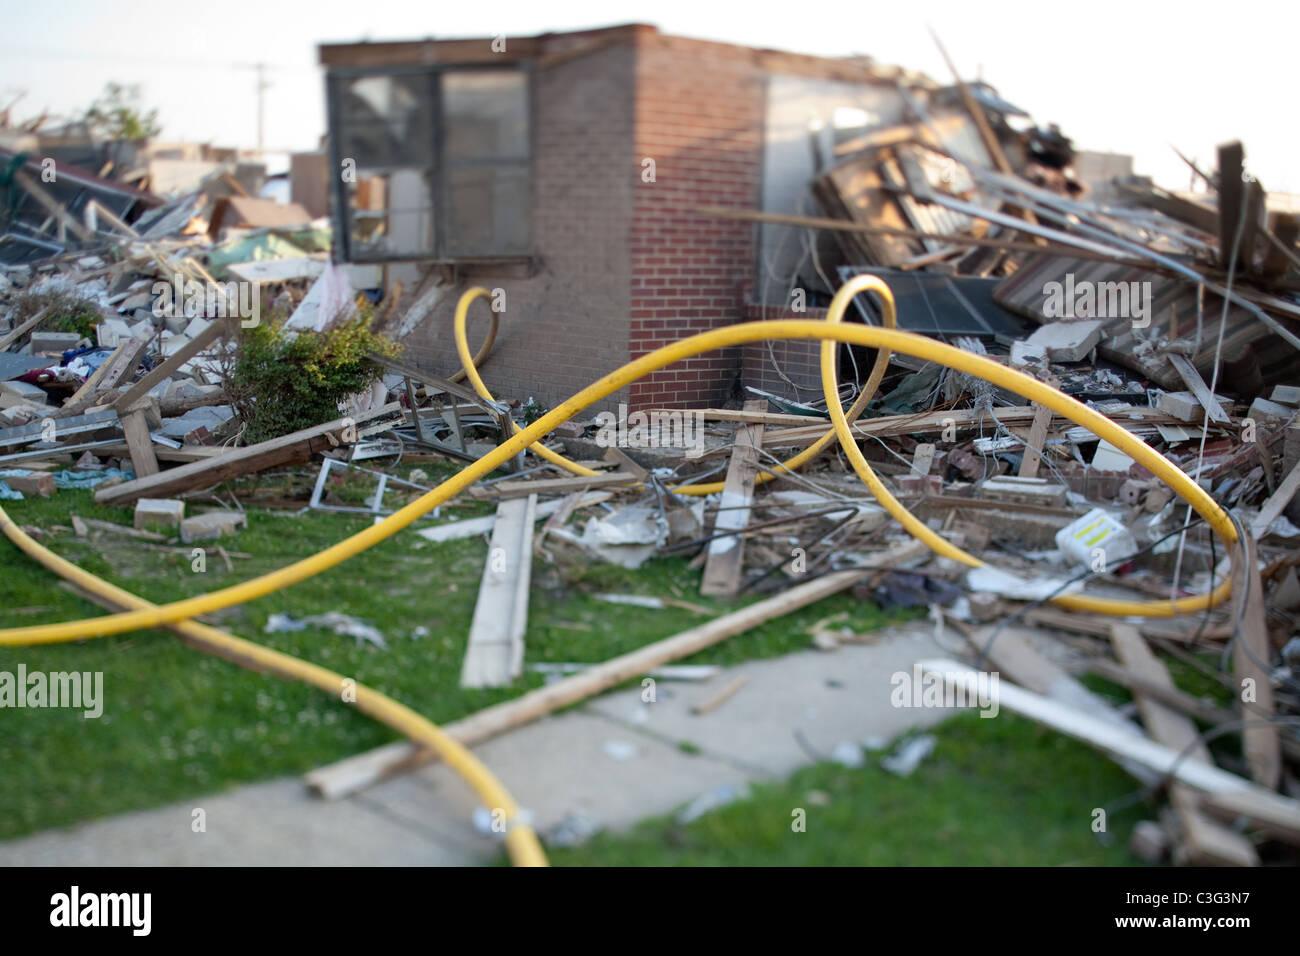 Debris surrounding homes destroyed by tornado in Tuscaloosa, Alabama. - Stock Image